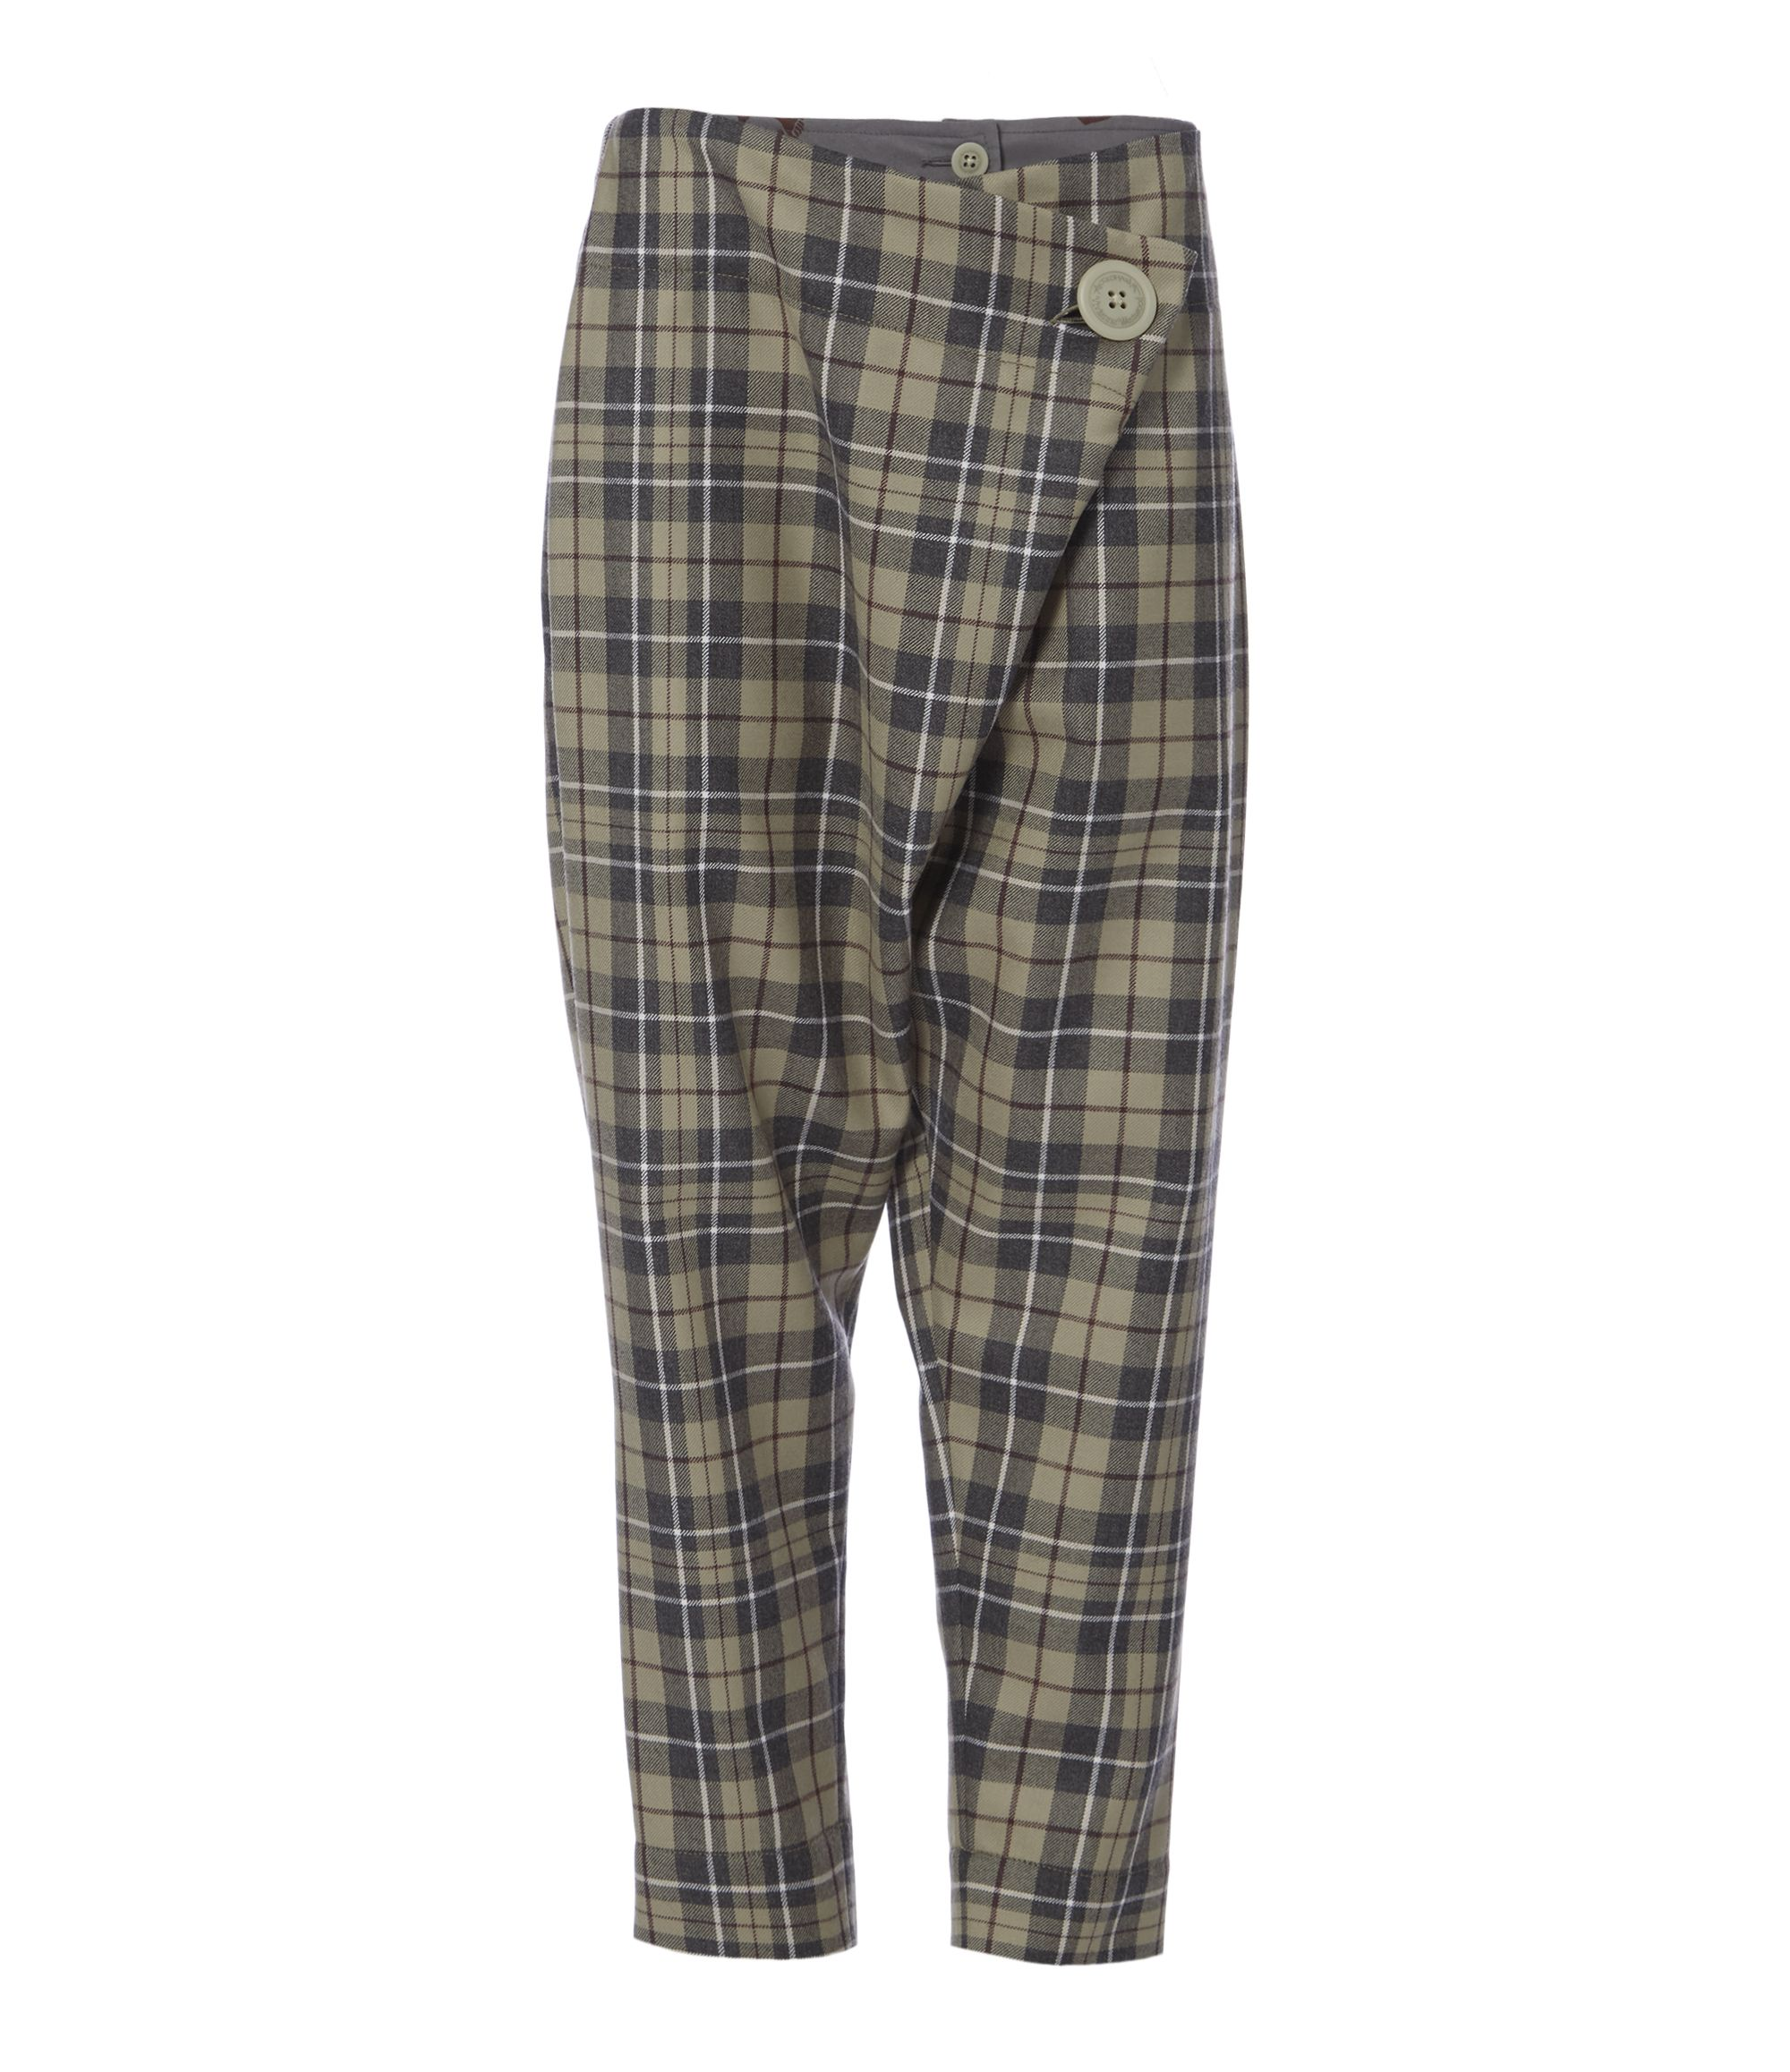 McStone D.F. Flap Trousers | Vivienne Westwood Anglomania